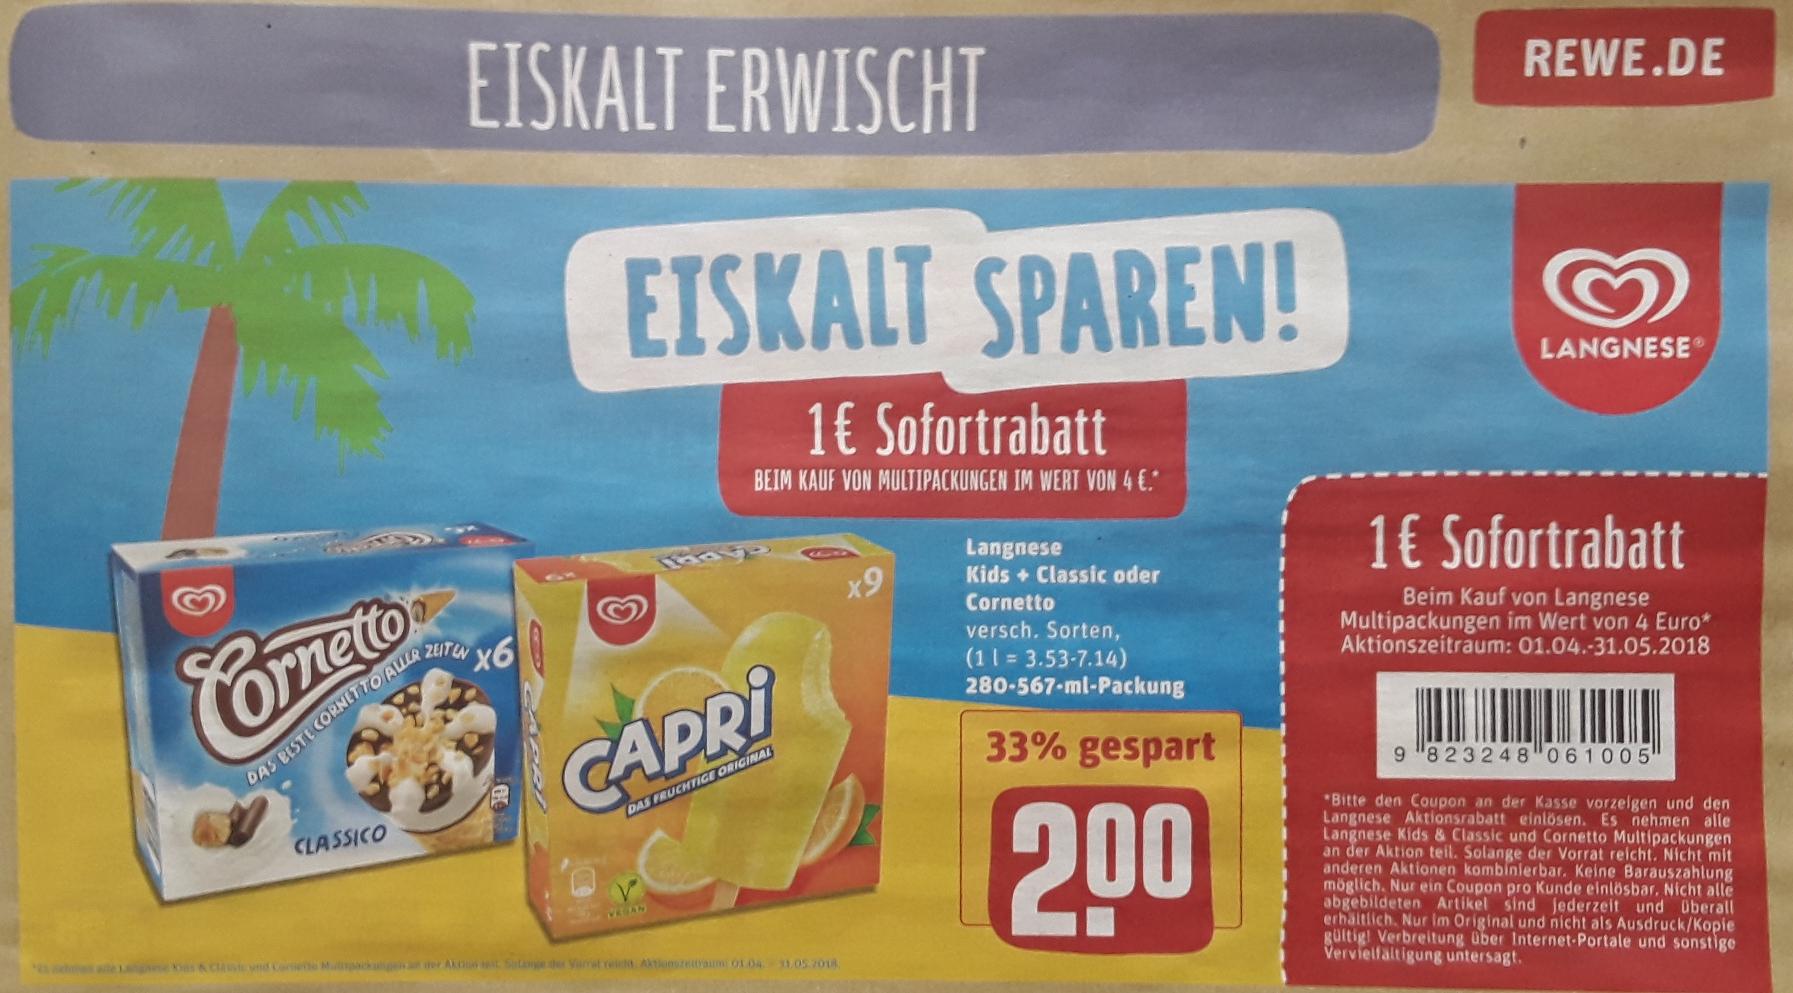 2 x Langnese Kids + Classic oder Cornetto Multipackungen für 3 € (= 1,50 € pro Multipack) Dank 1 € Sofortrabatt @ Rewe ab 03.04.